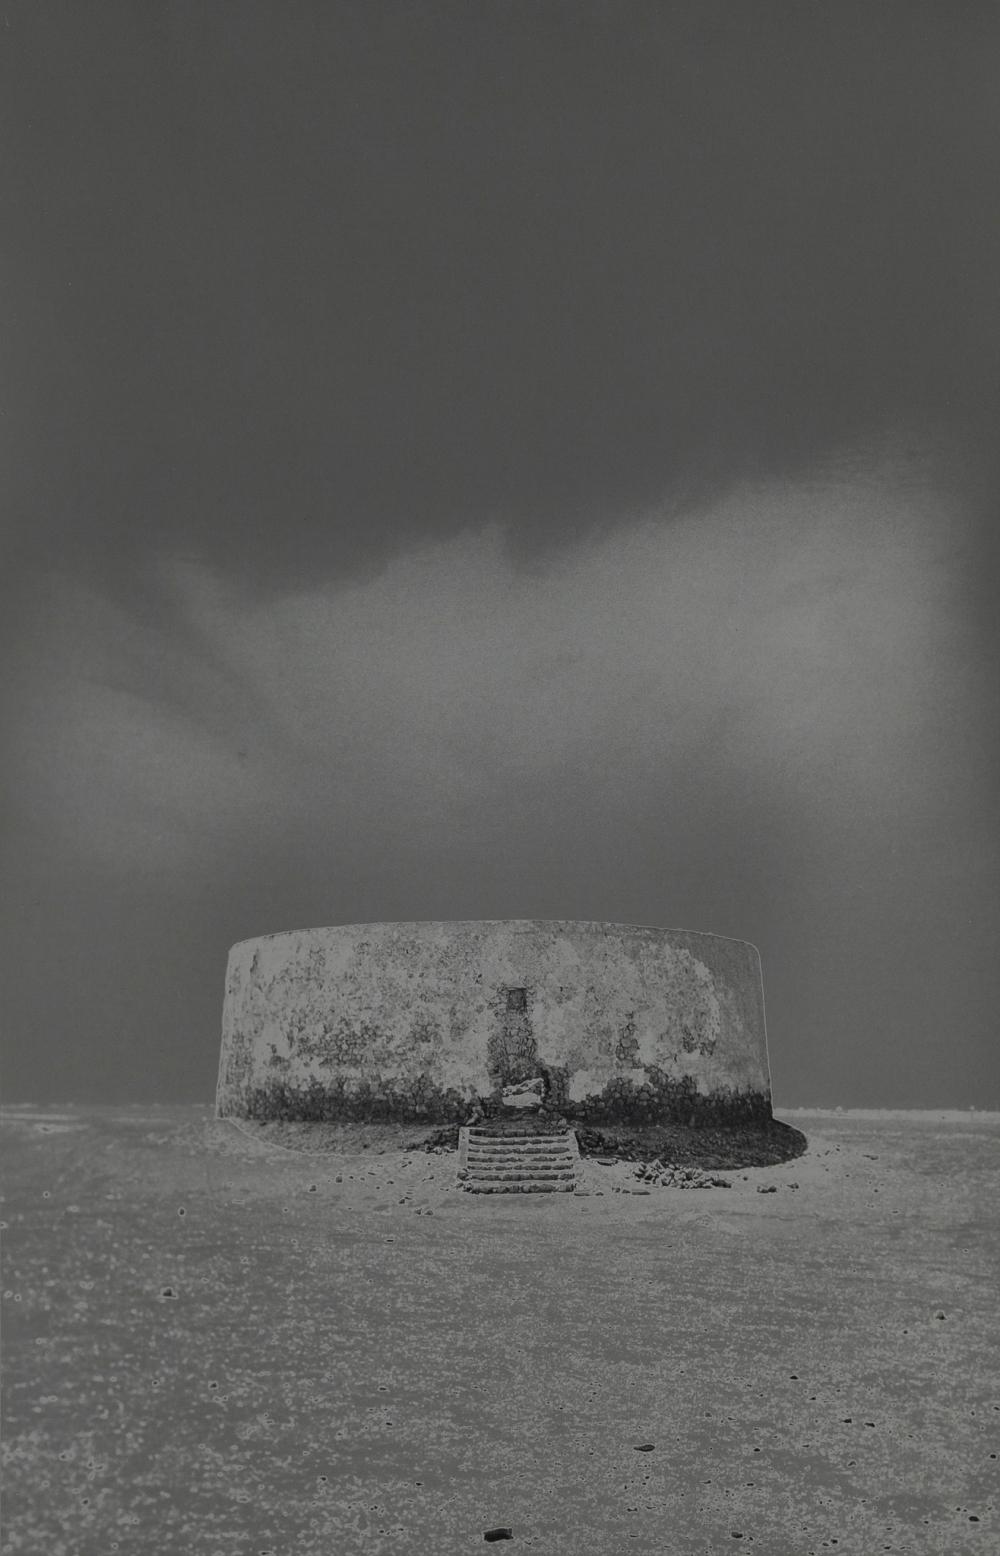 Alexandre Arminjon - Tour du Silence, Iran, 2017